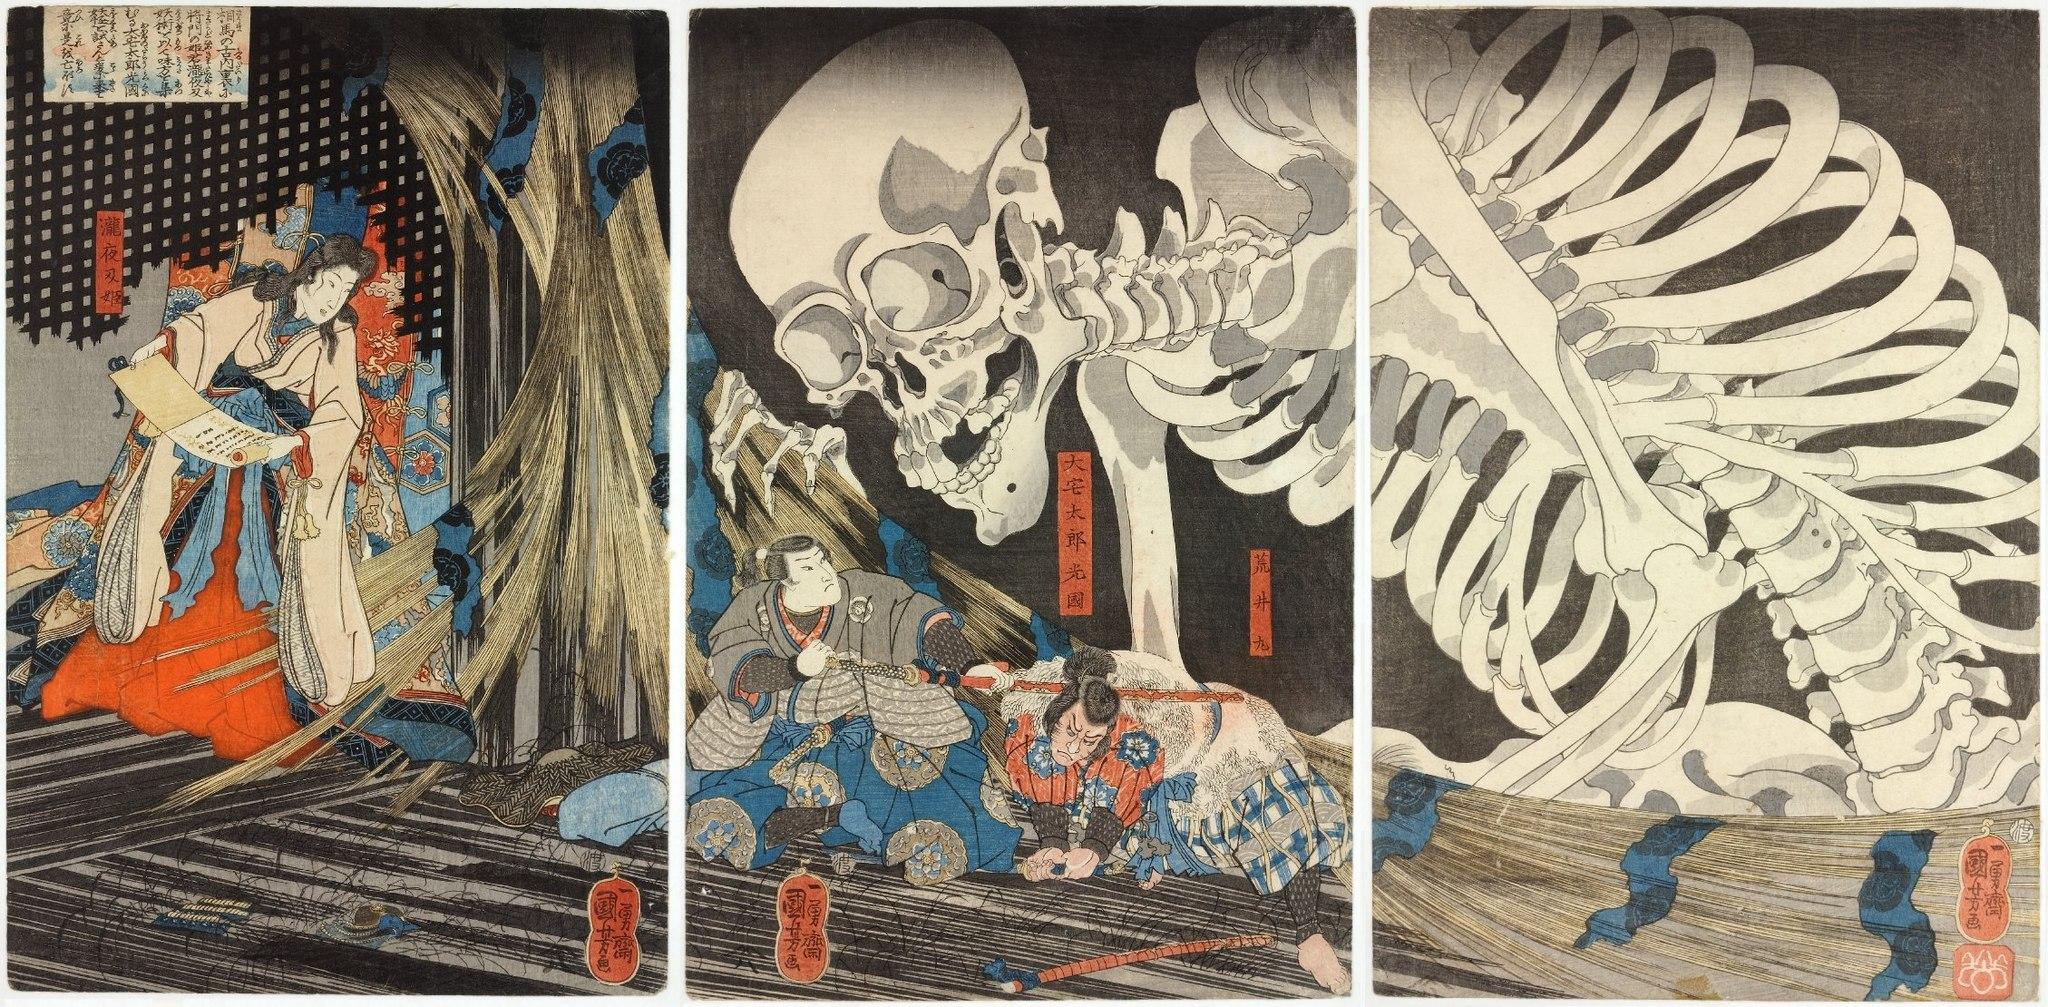 2048px Takiyasha the Witch and the Skeleton Spectre